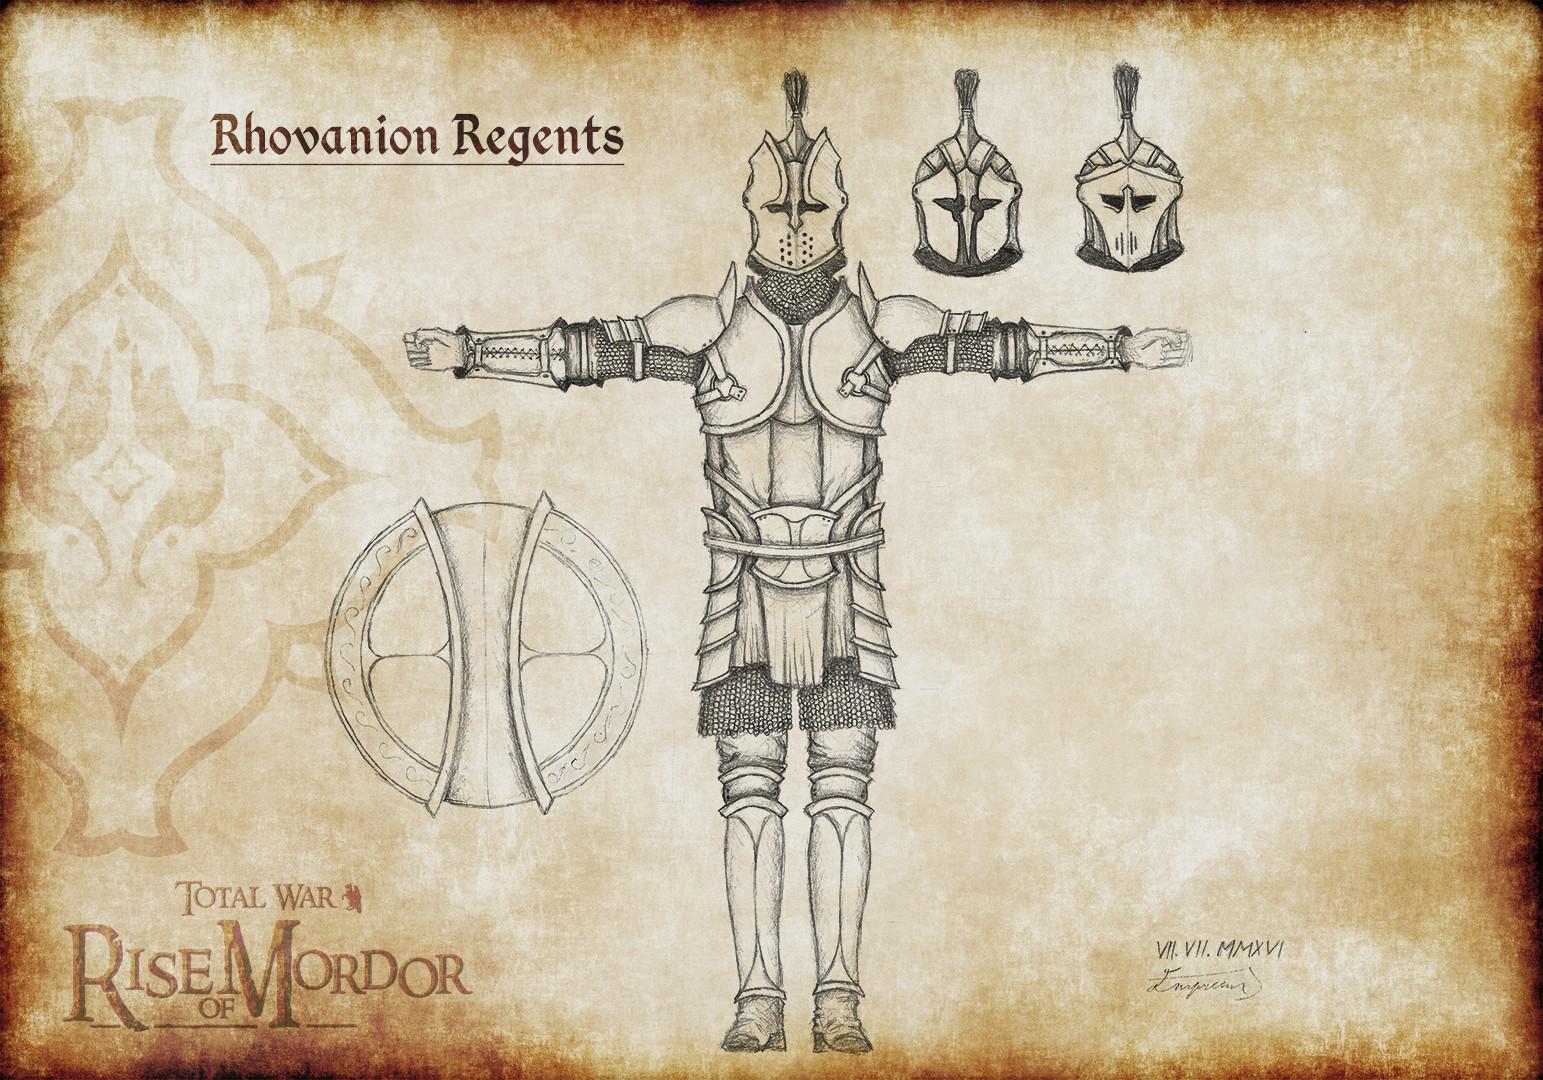 Adam dotlacil concept rhovanion regents